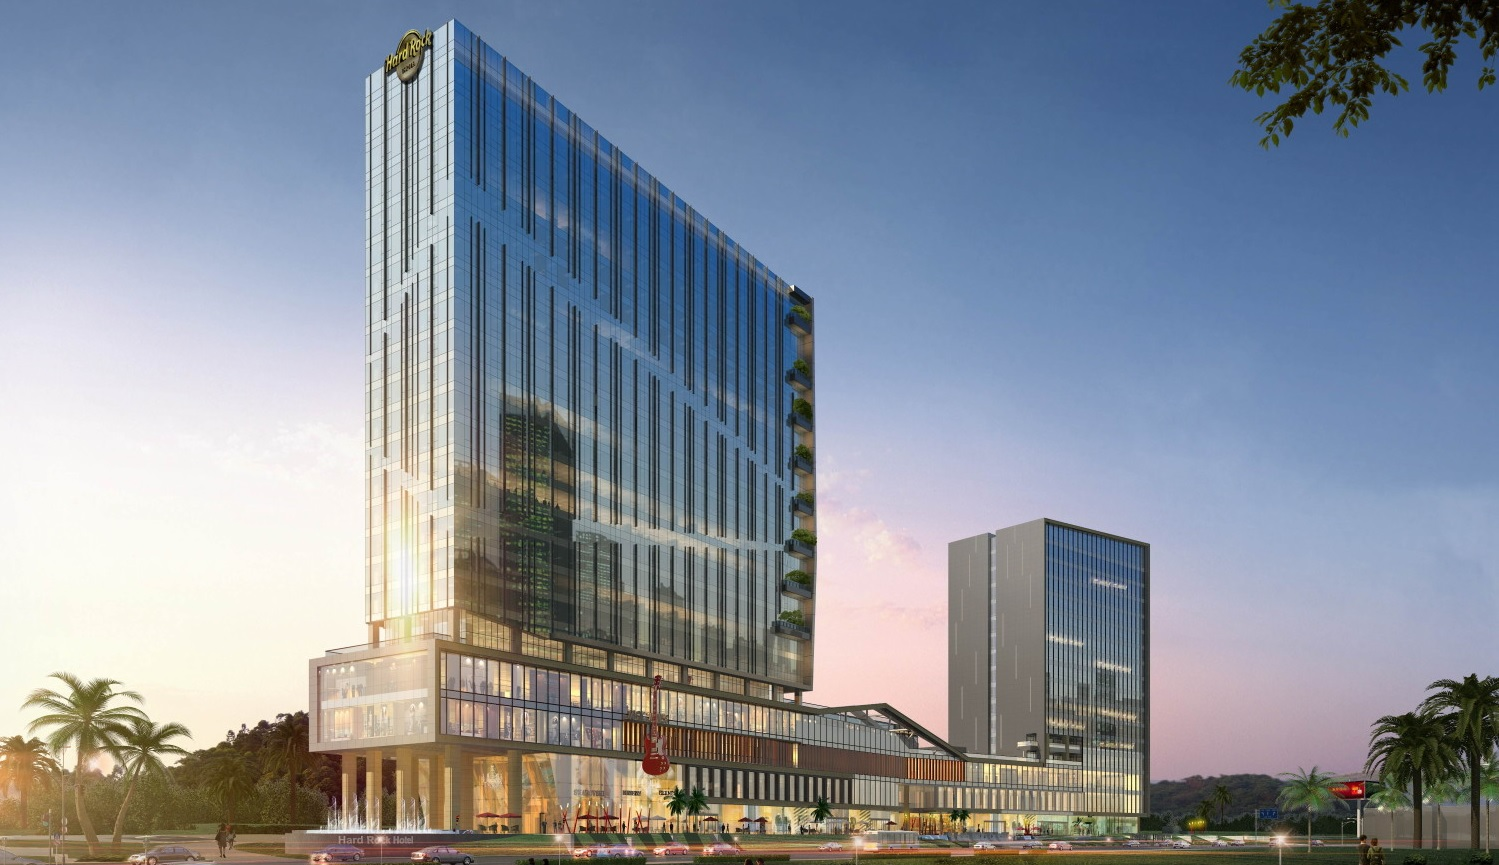 Hard Rock International announces launch of Hard Rock Hotel Shenzhen